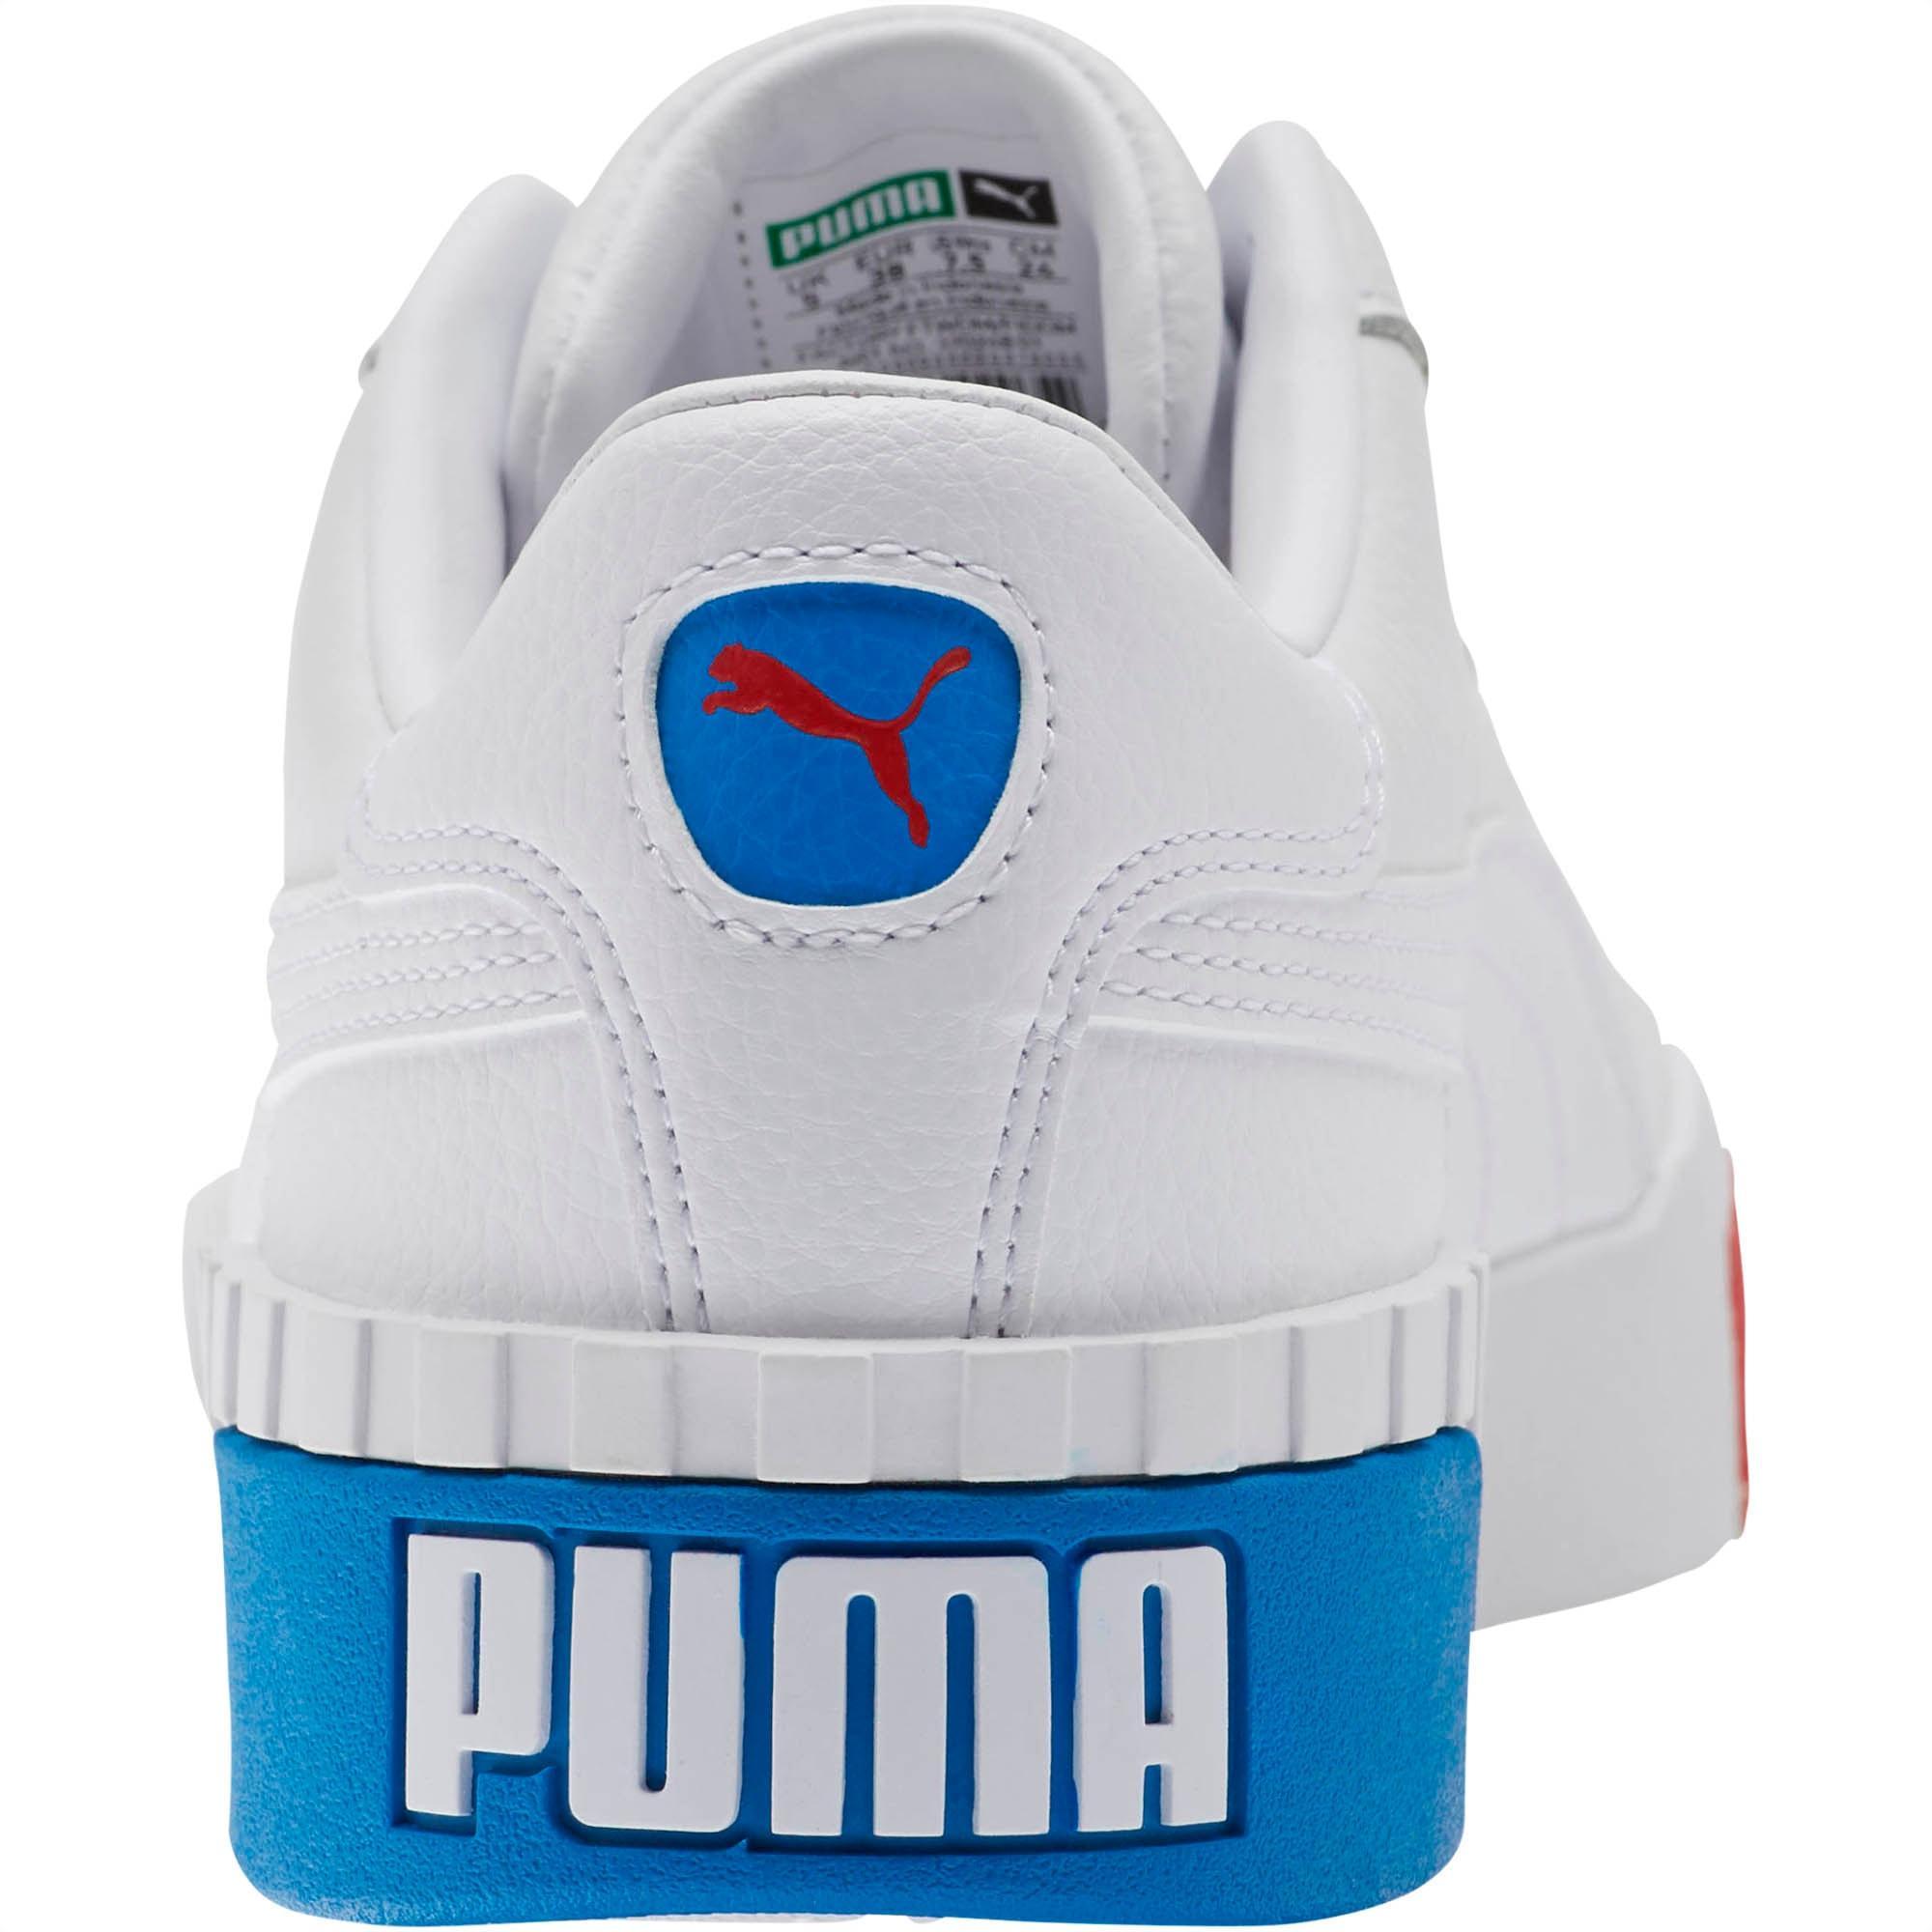 PUMA Leather Cali Rwb Women's Sneakers